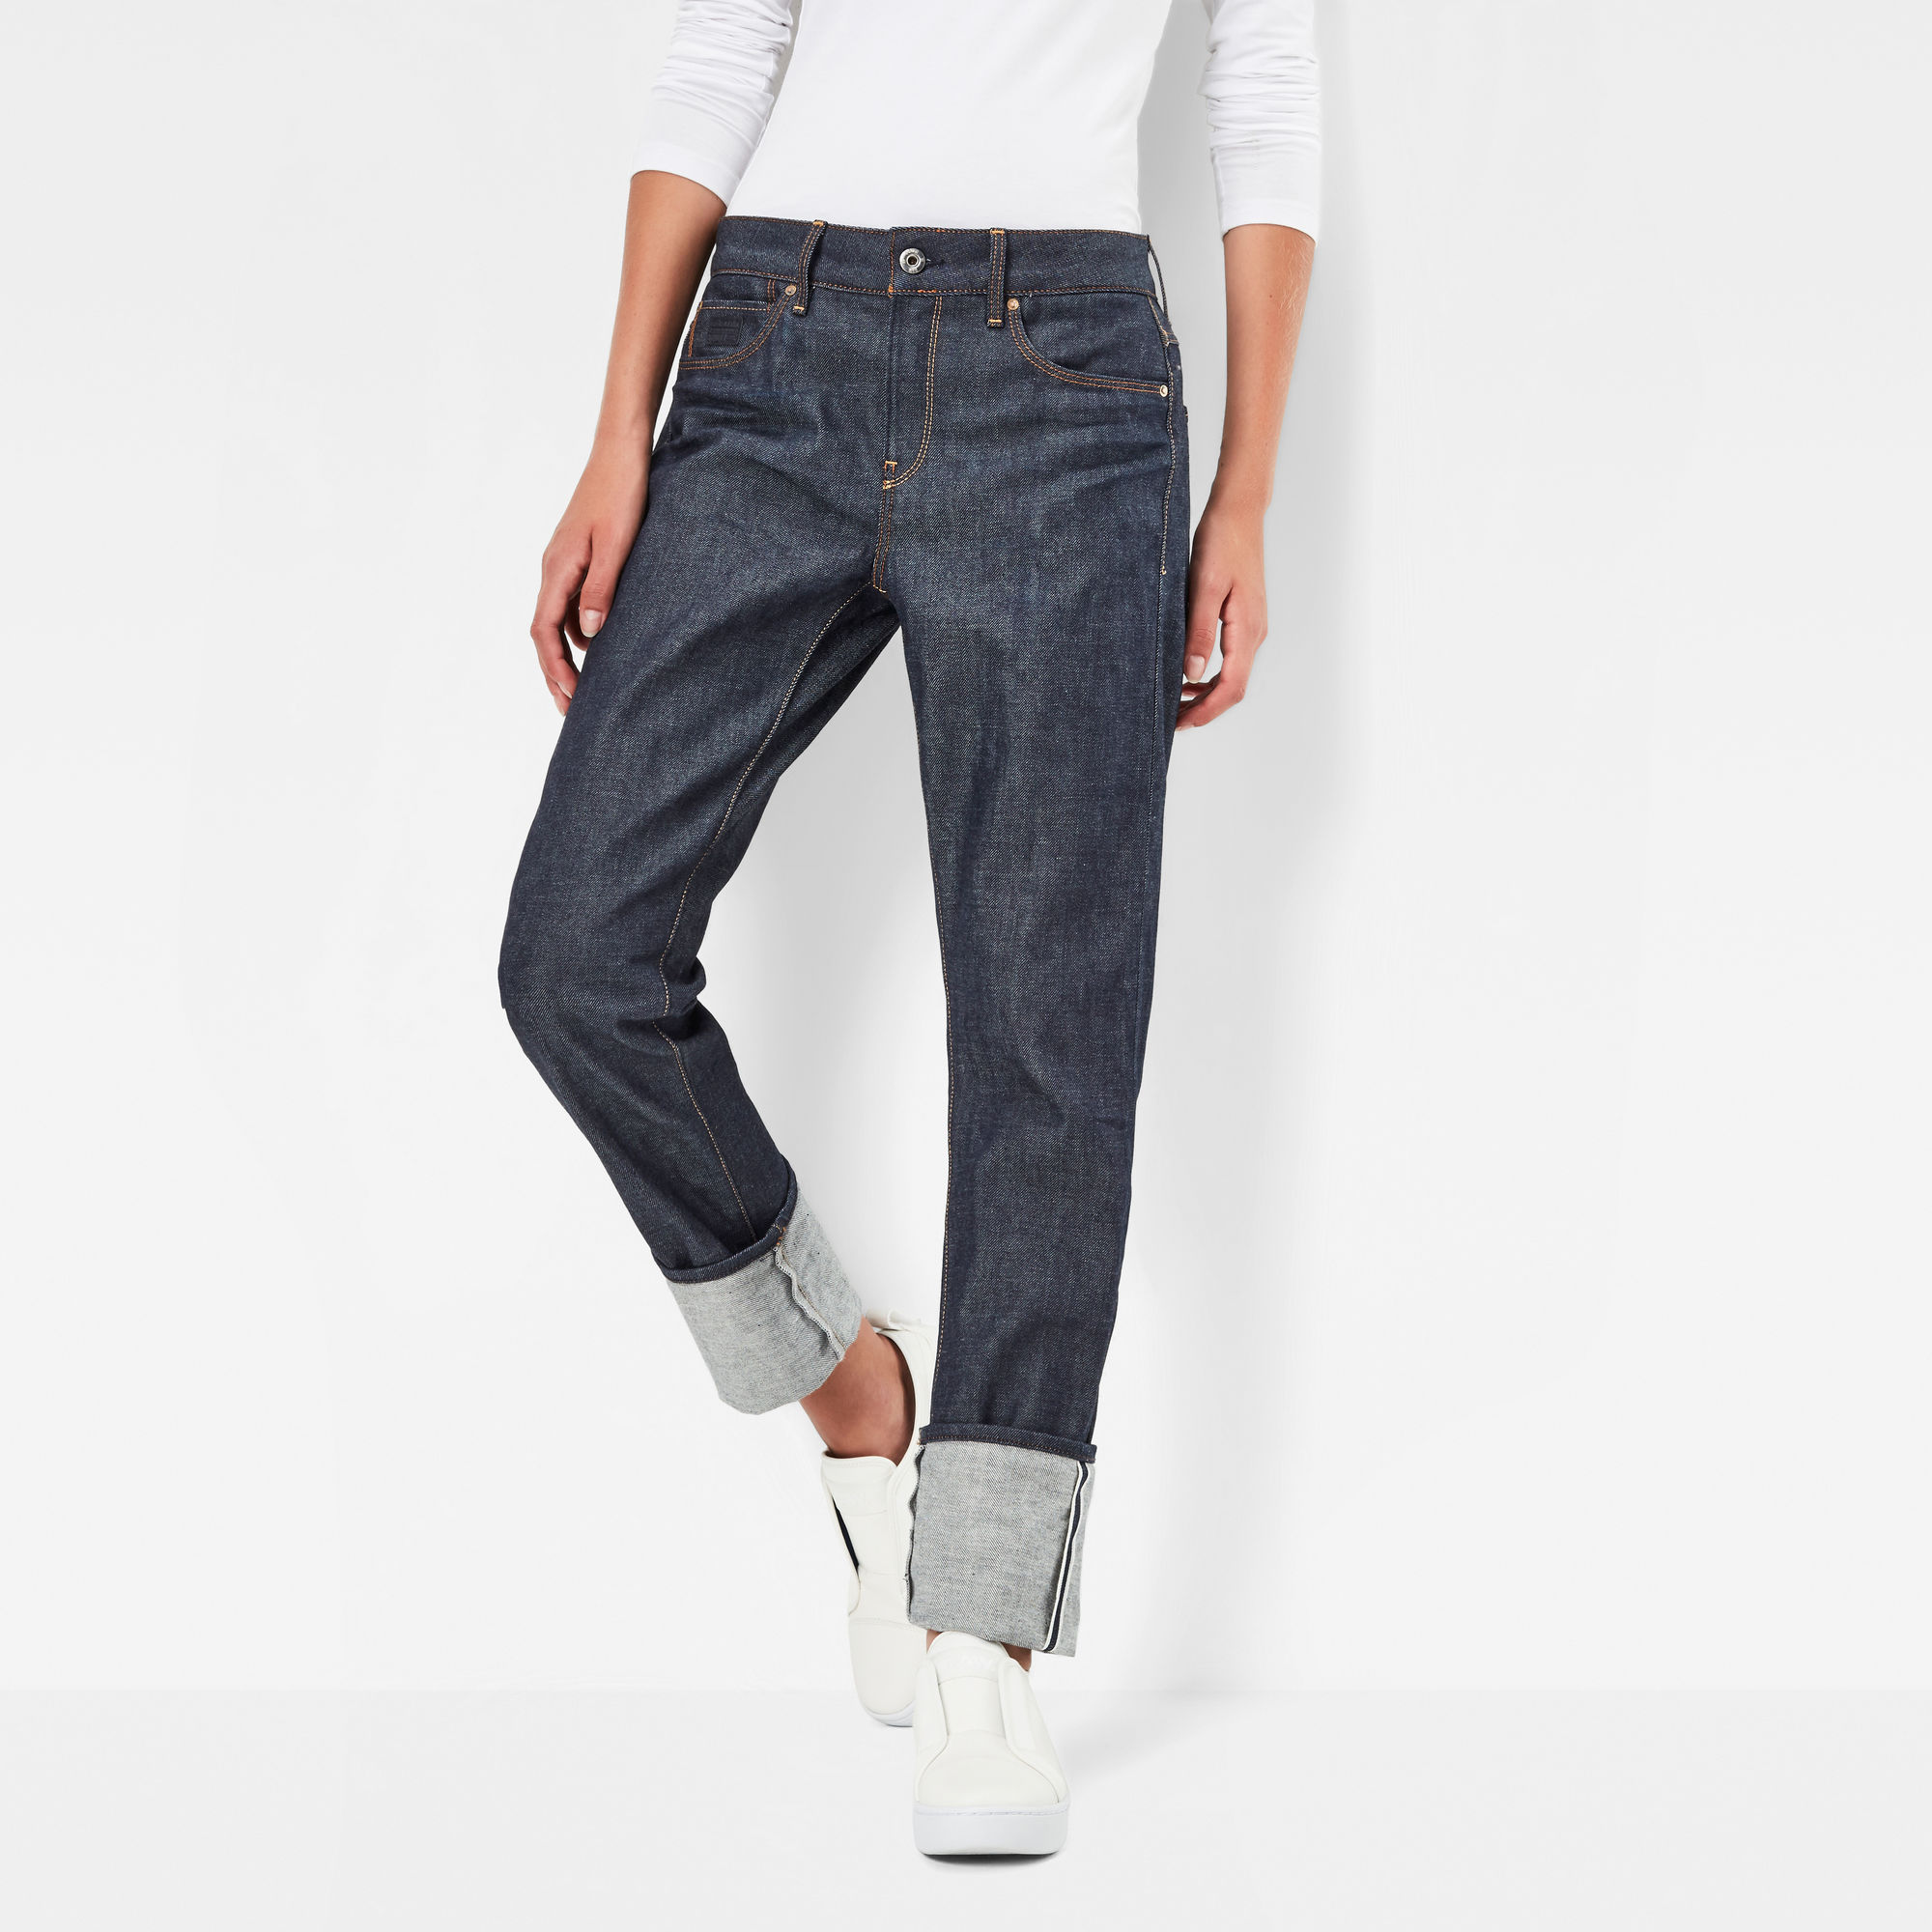 Raw Essentials US First High Waist Jeans